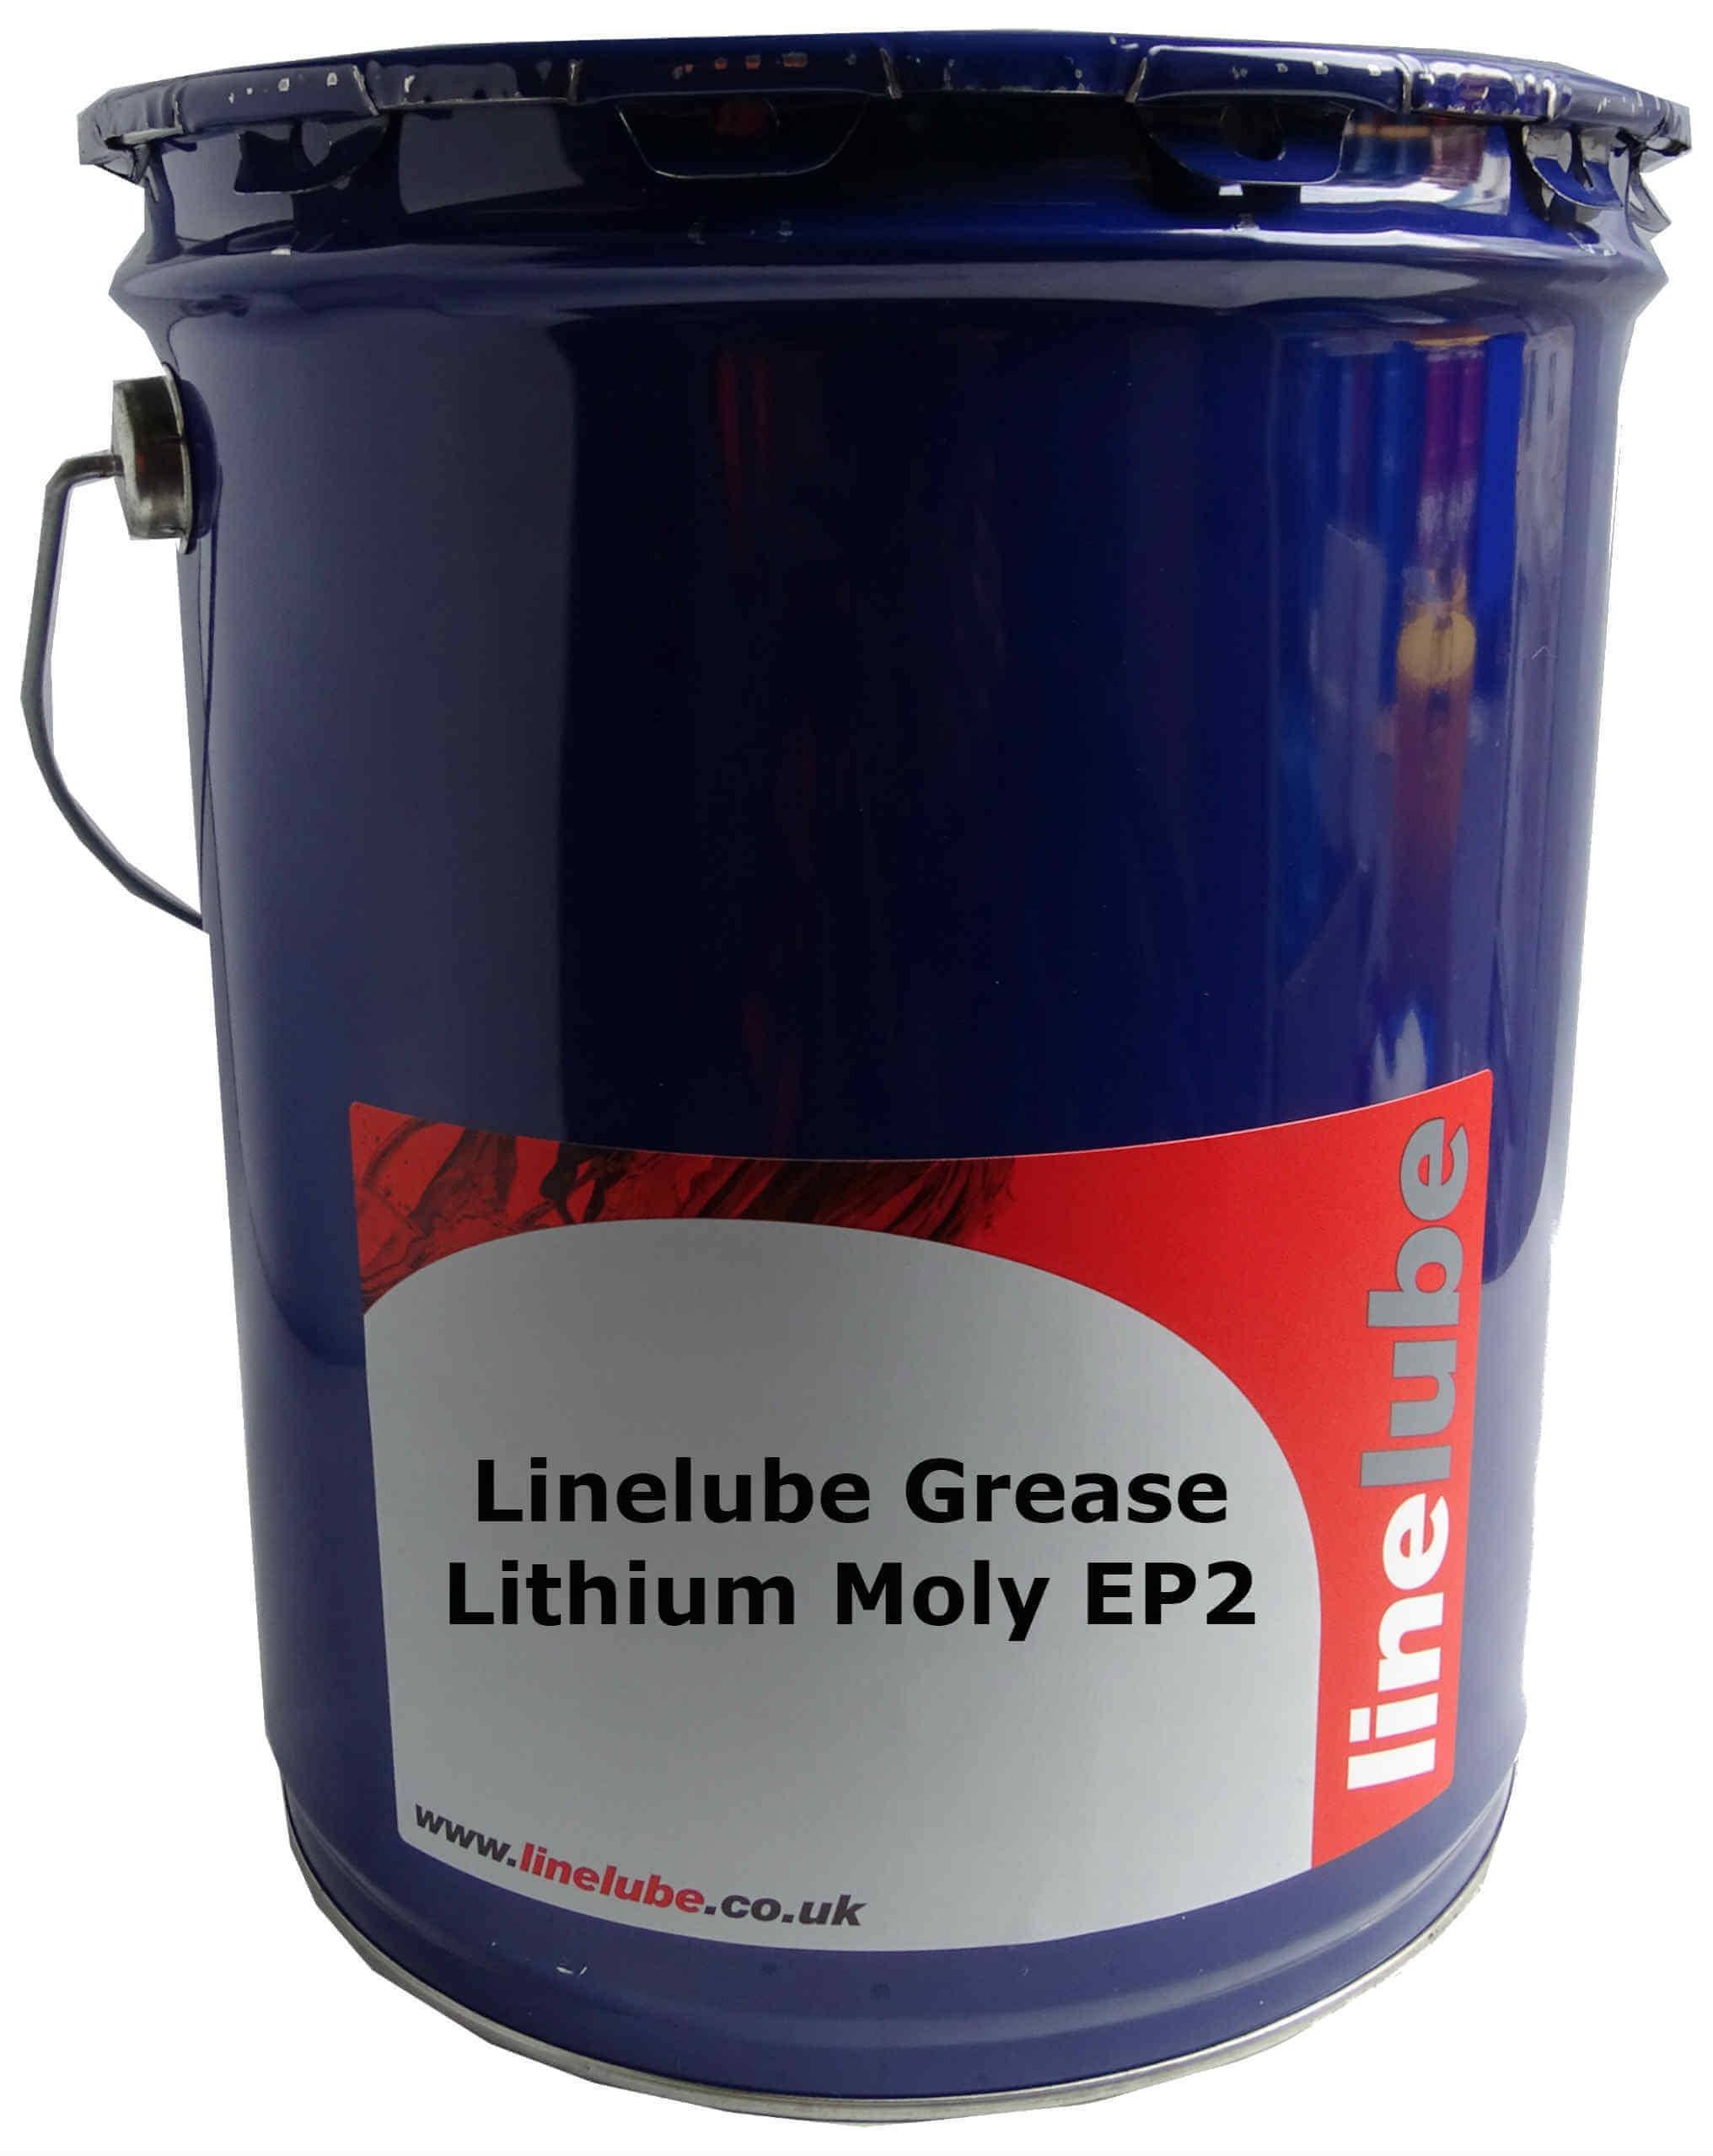 Linelube Grease Lithium Moly EP2